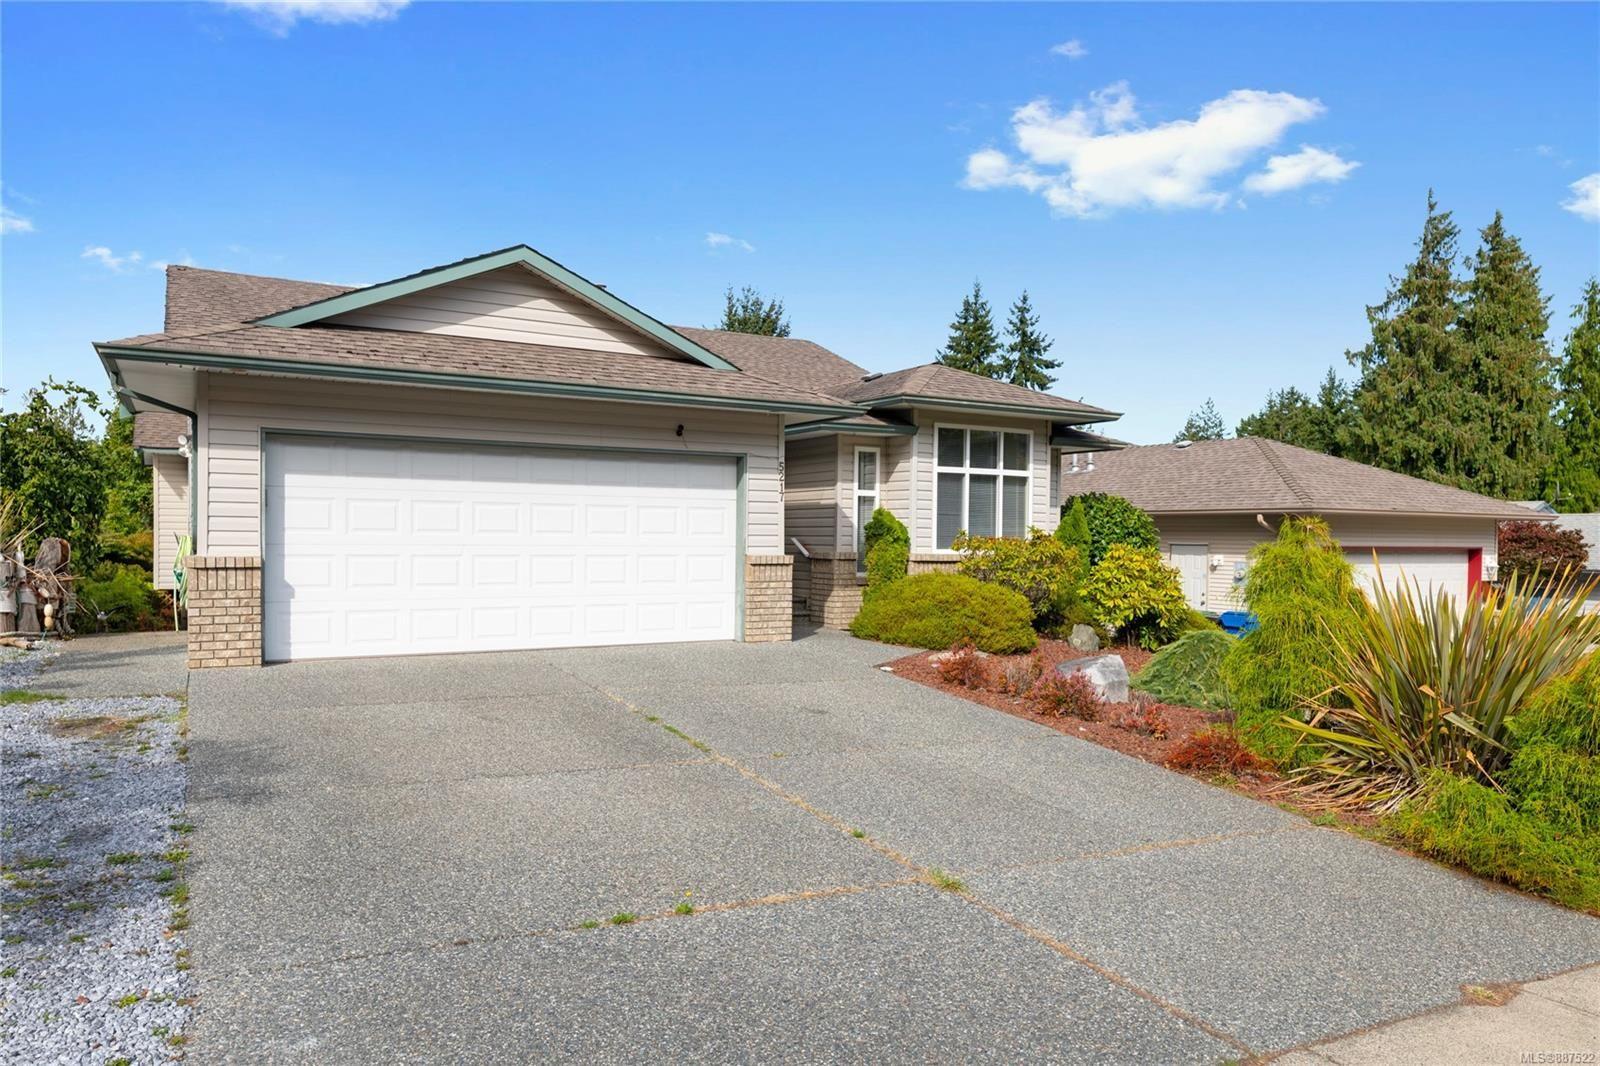 Main Photo: 5217 Fox Pl in Nanaimo: Na North Nanaimo House for sale : MLS®# 887522